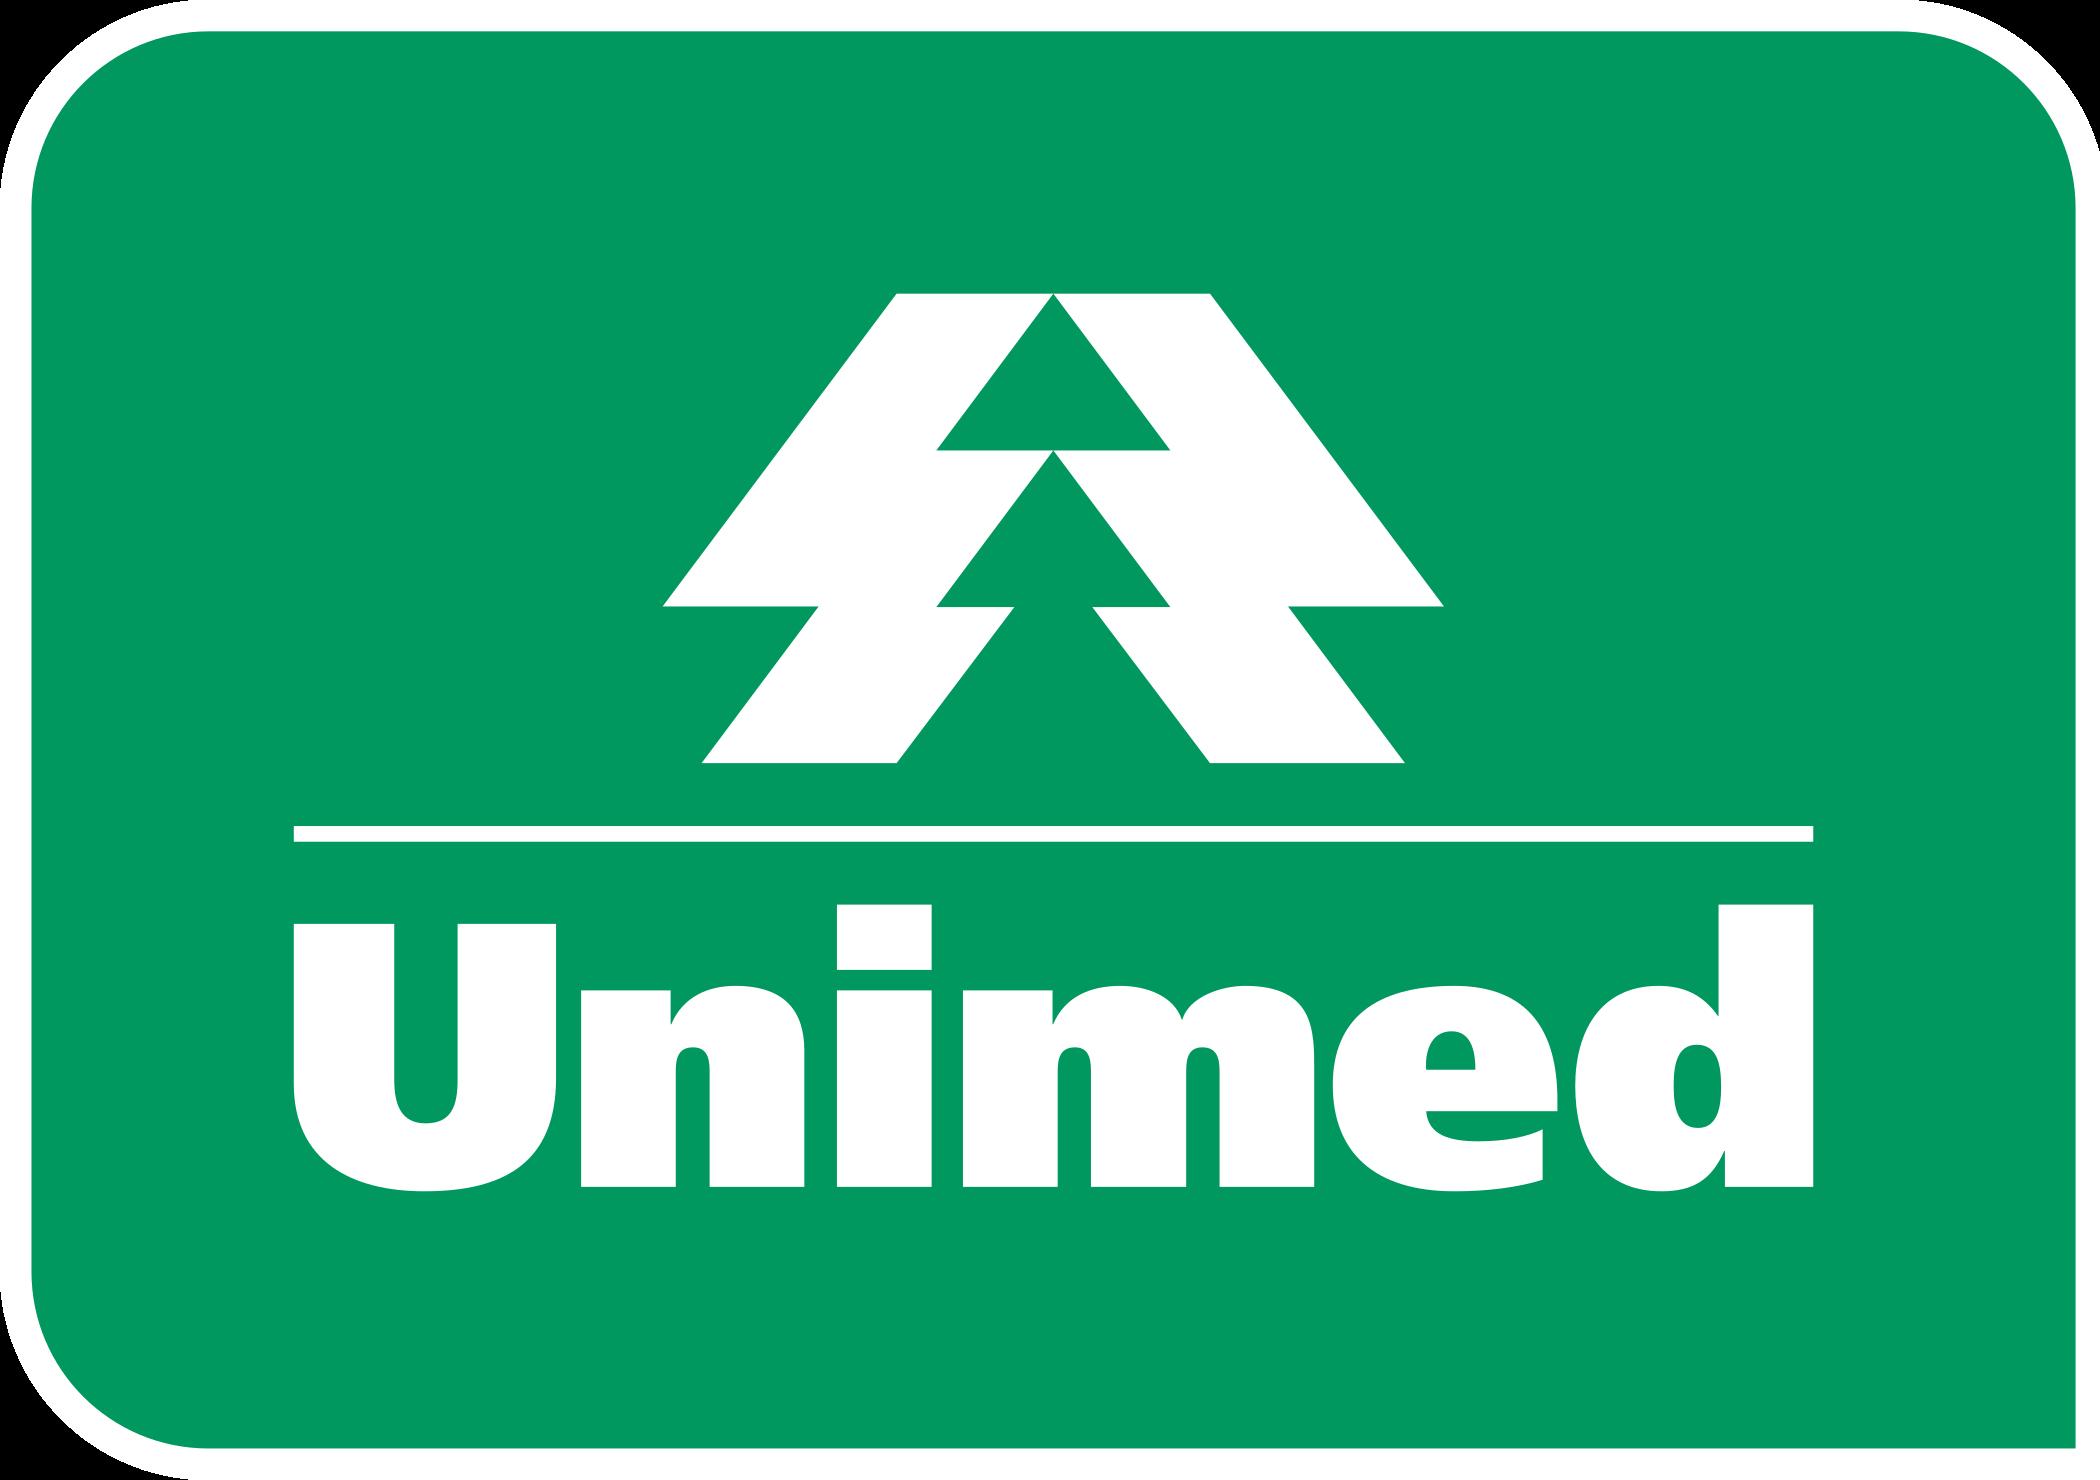 unimed logo 3 1 - Unimed Logo